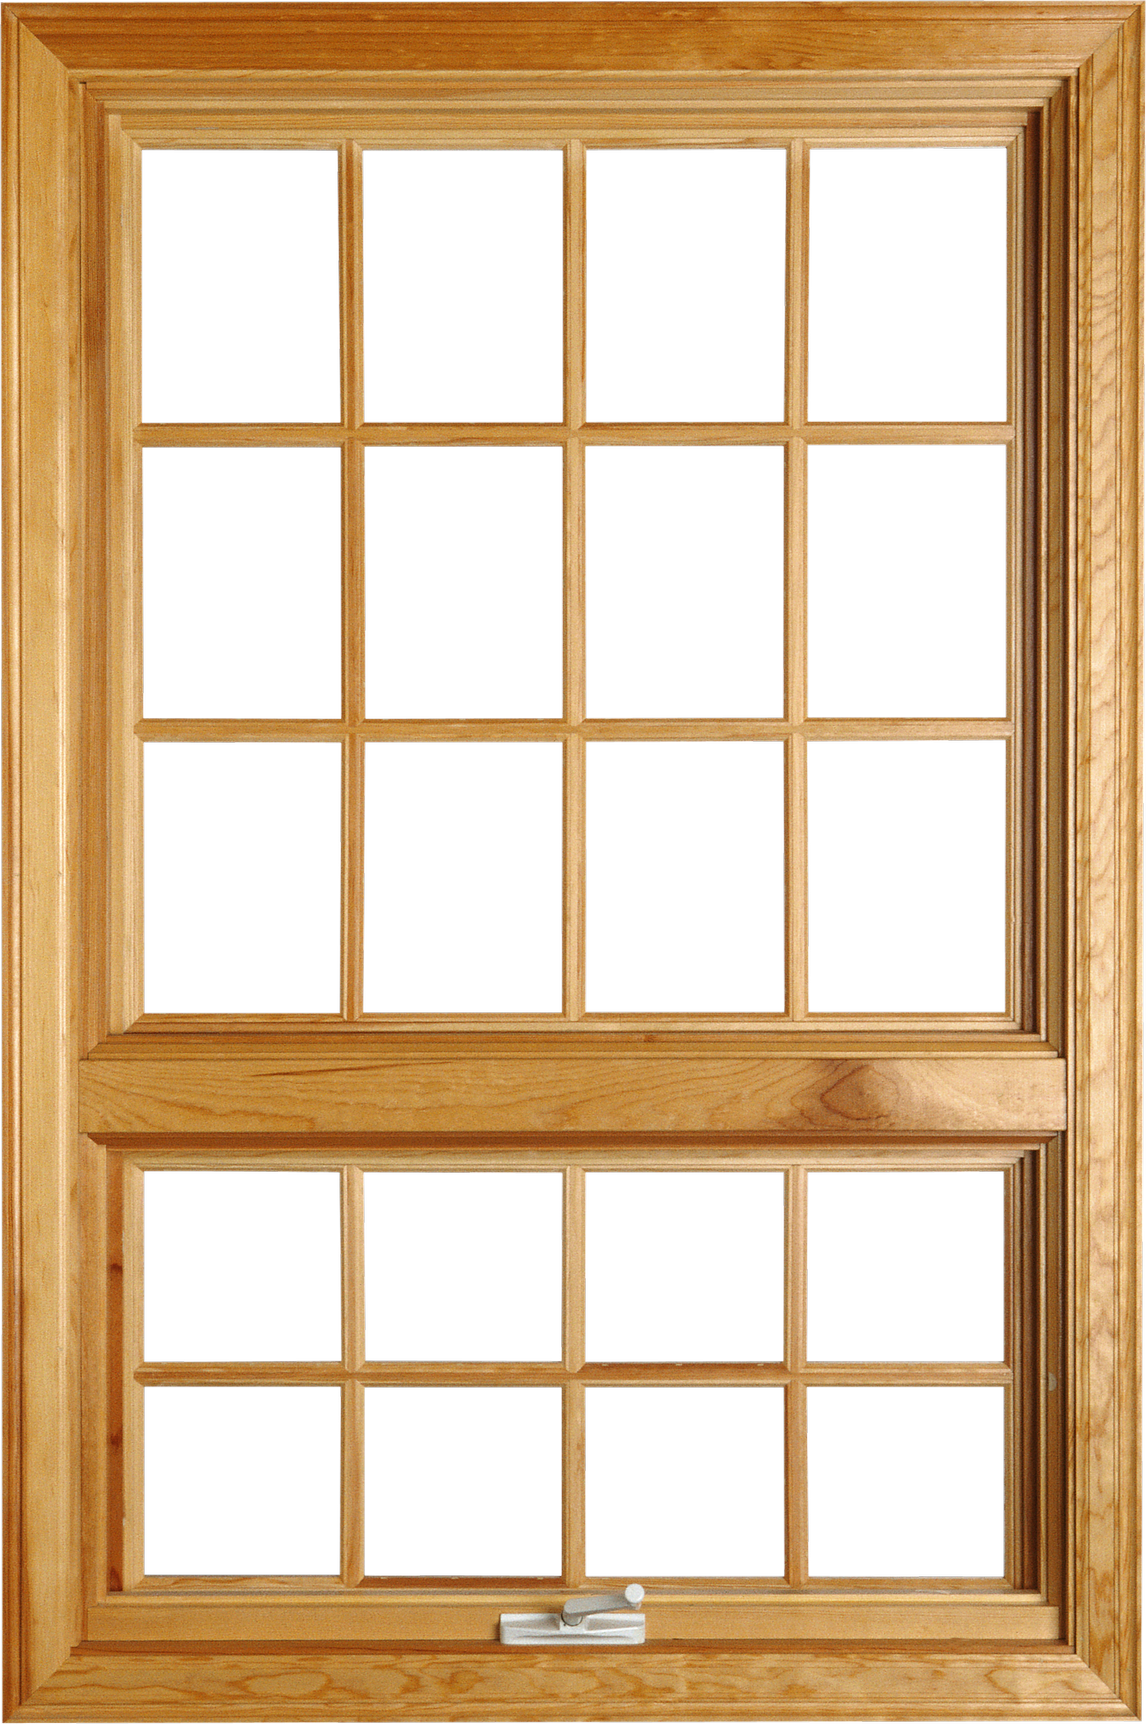 Window Png Image Furniture Plans Kitchen Furniture Furniture